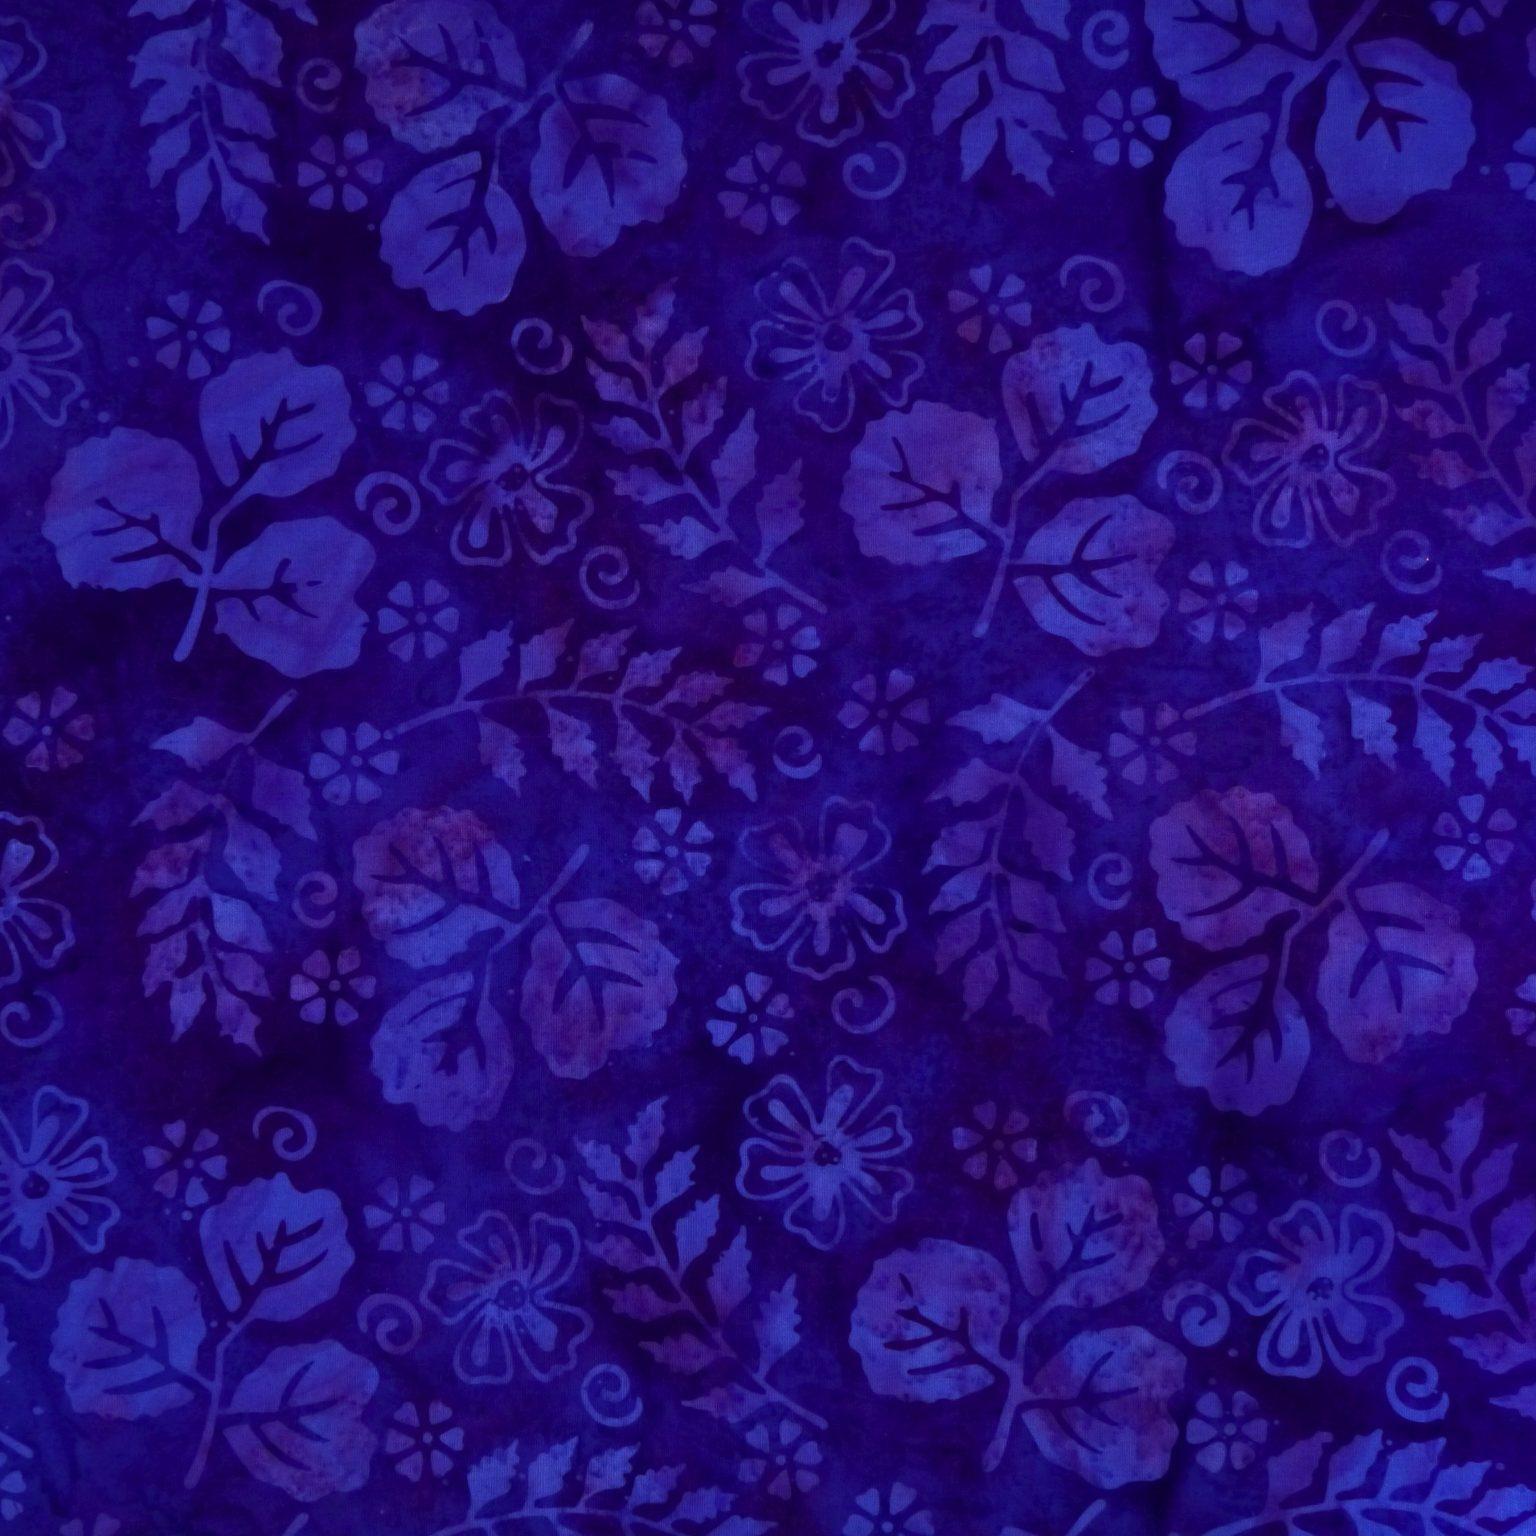 Troboss - Fairytale - Batik - 1/2m cut 56244